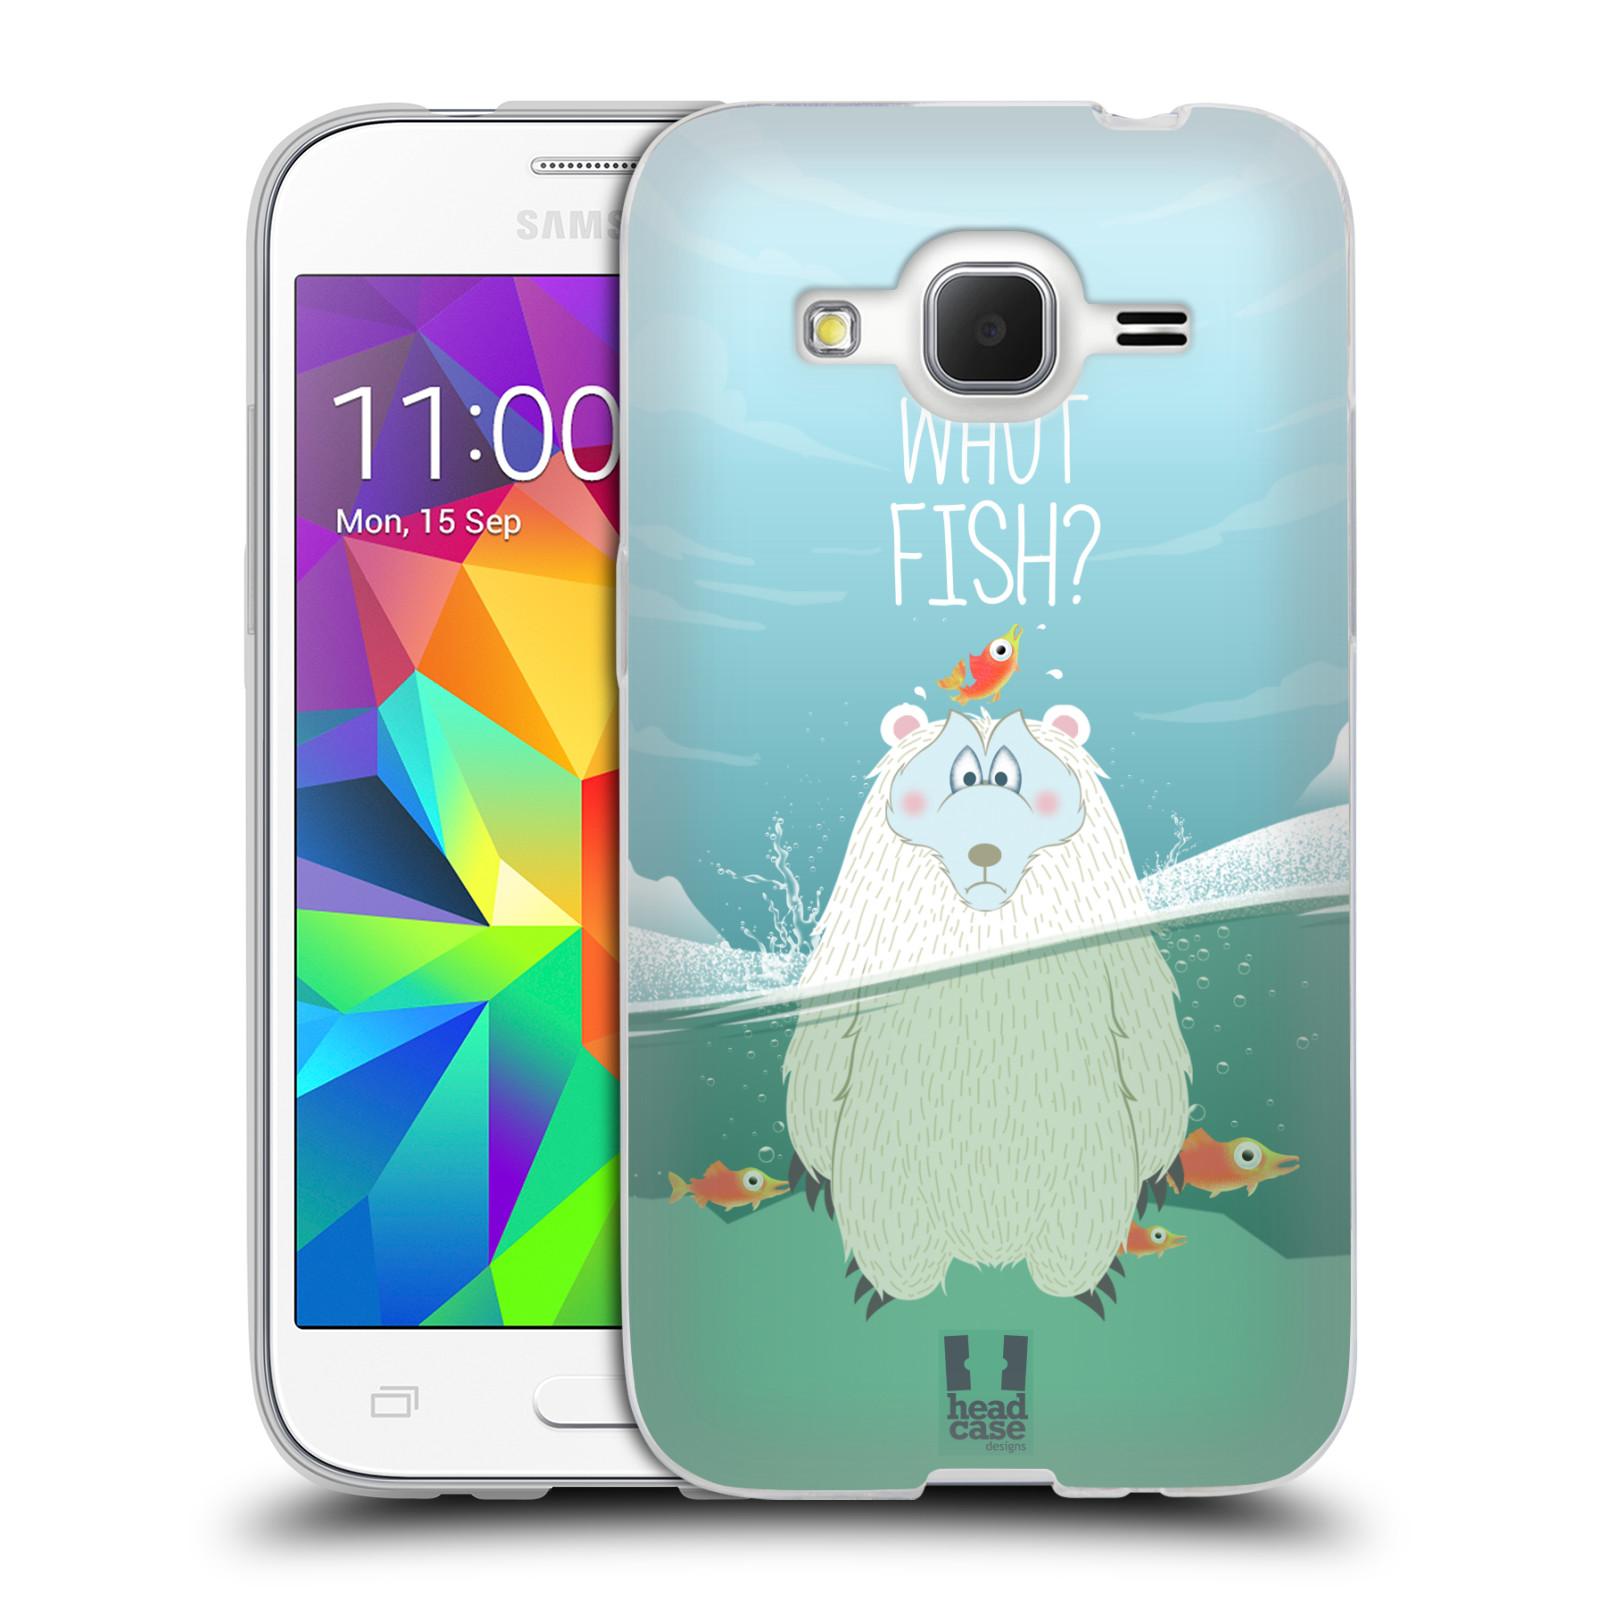 Silikonové pouzdro na mobil Samsung Galaxy Core Prime LTE HEAD CASE Medvěd Whut Fish?